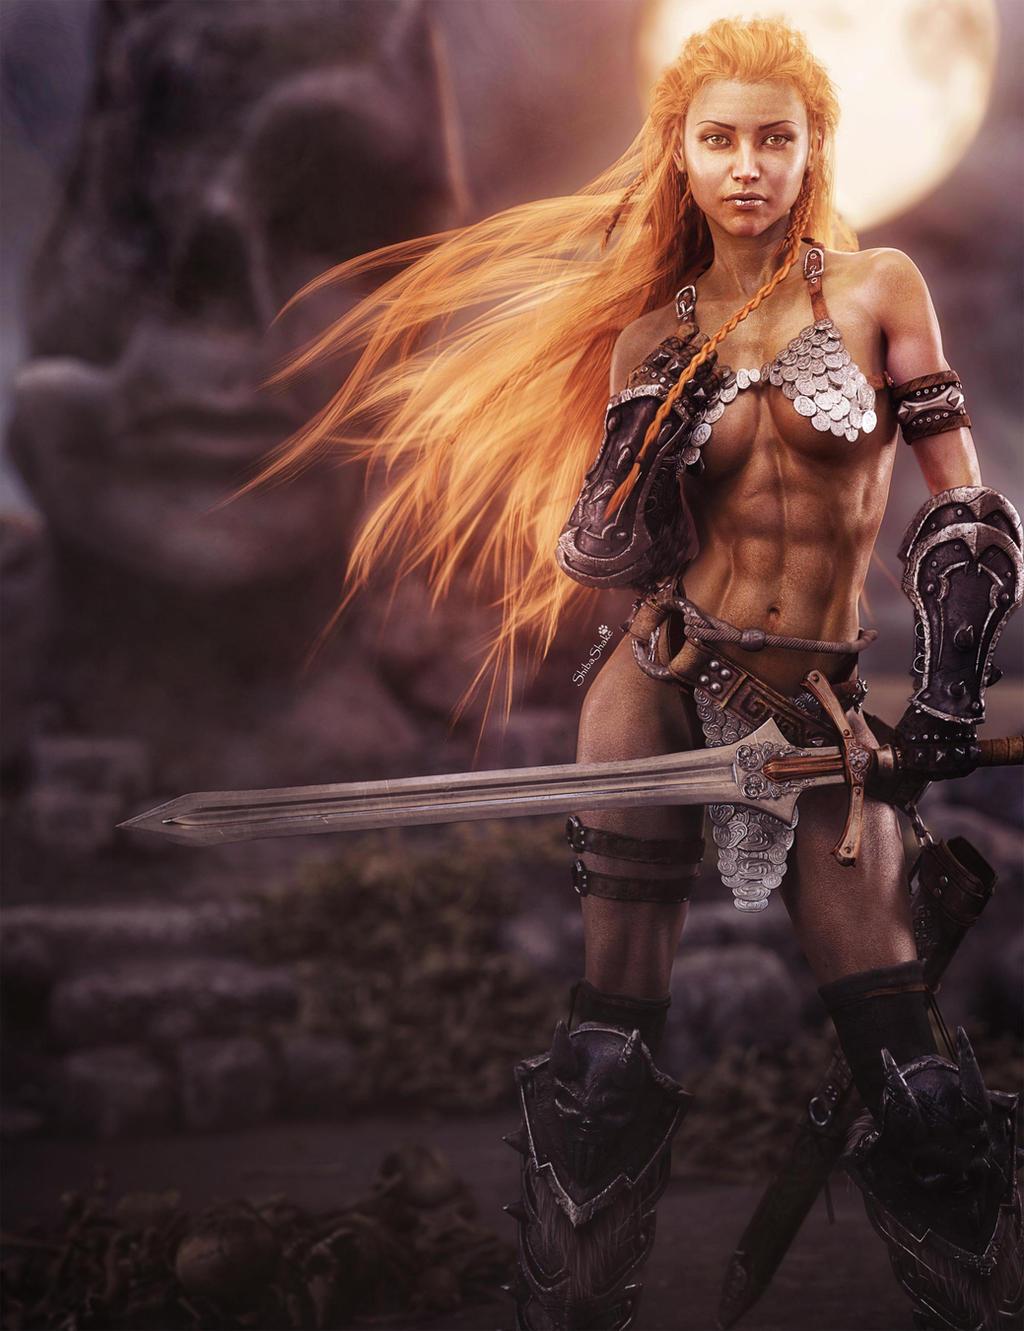 Red sonja fantasy fan art by shibashake on deviantart - Fantasy female warrior artwork ...